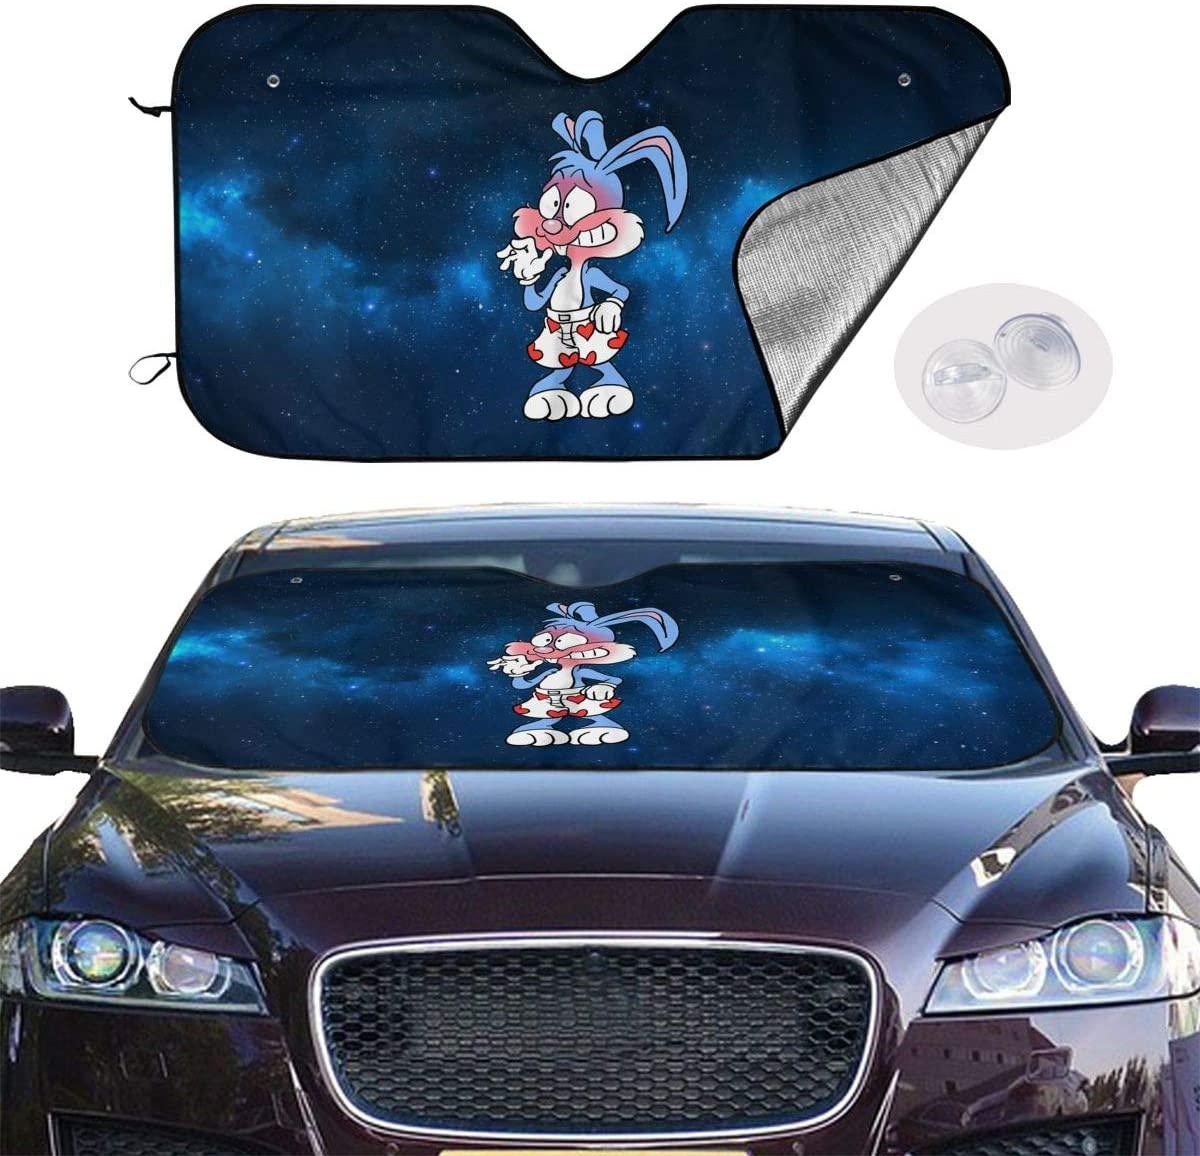 Abkola Bugs Bunny Universal and Stylish Car Windshield Visor